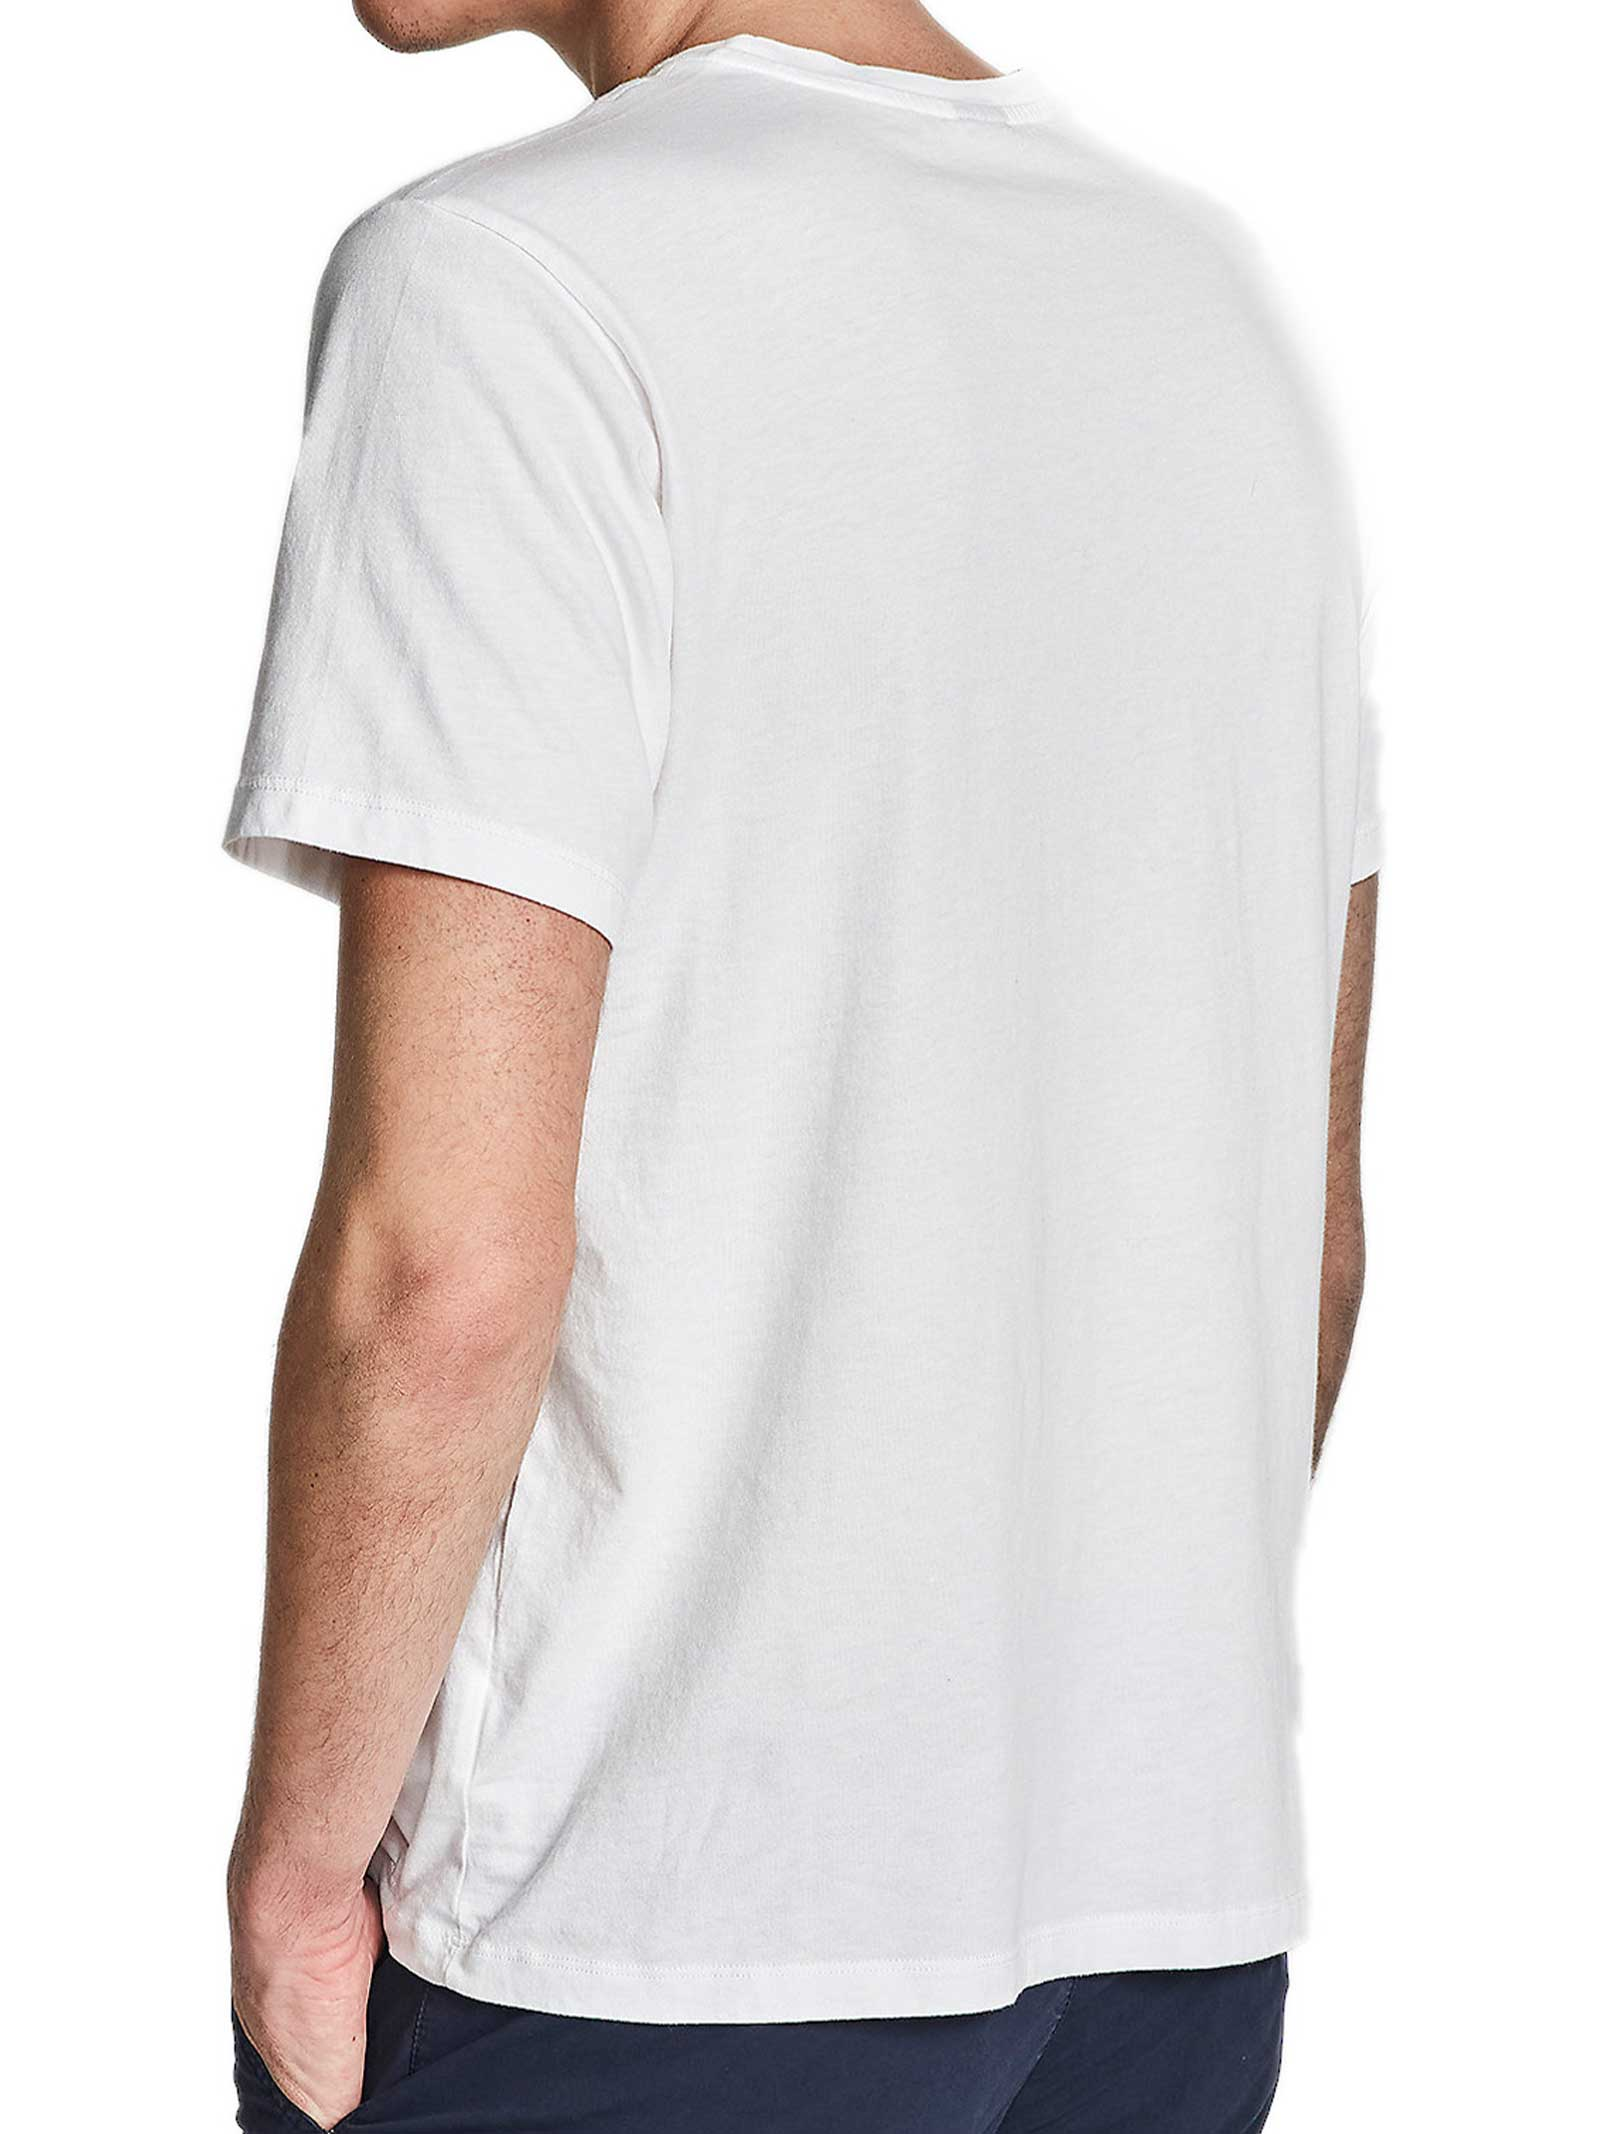 T-SHIRT UOMO NORTH SAILS | T-shirt | 6925300101